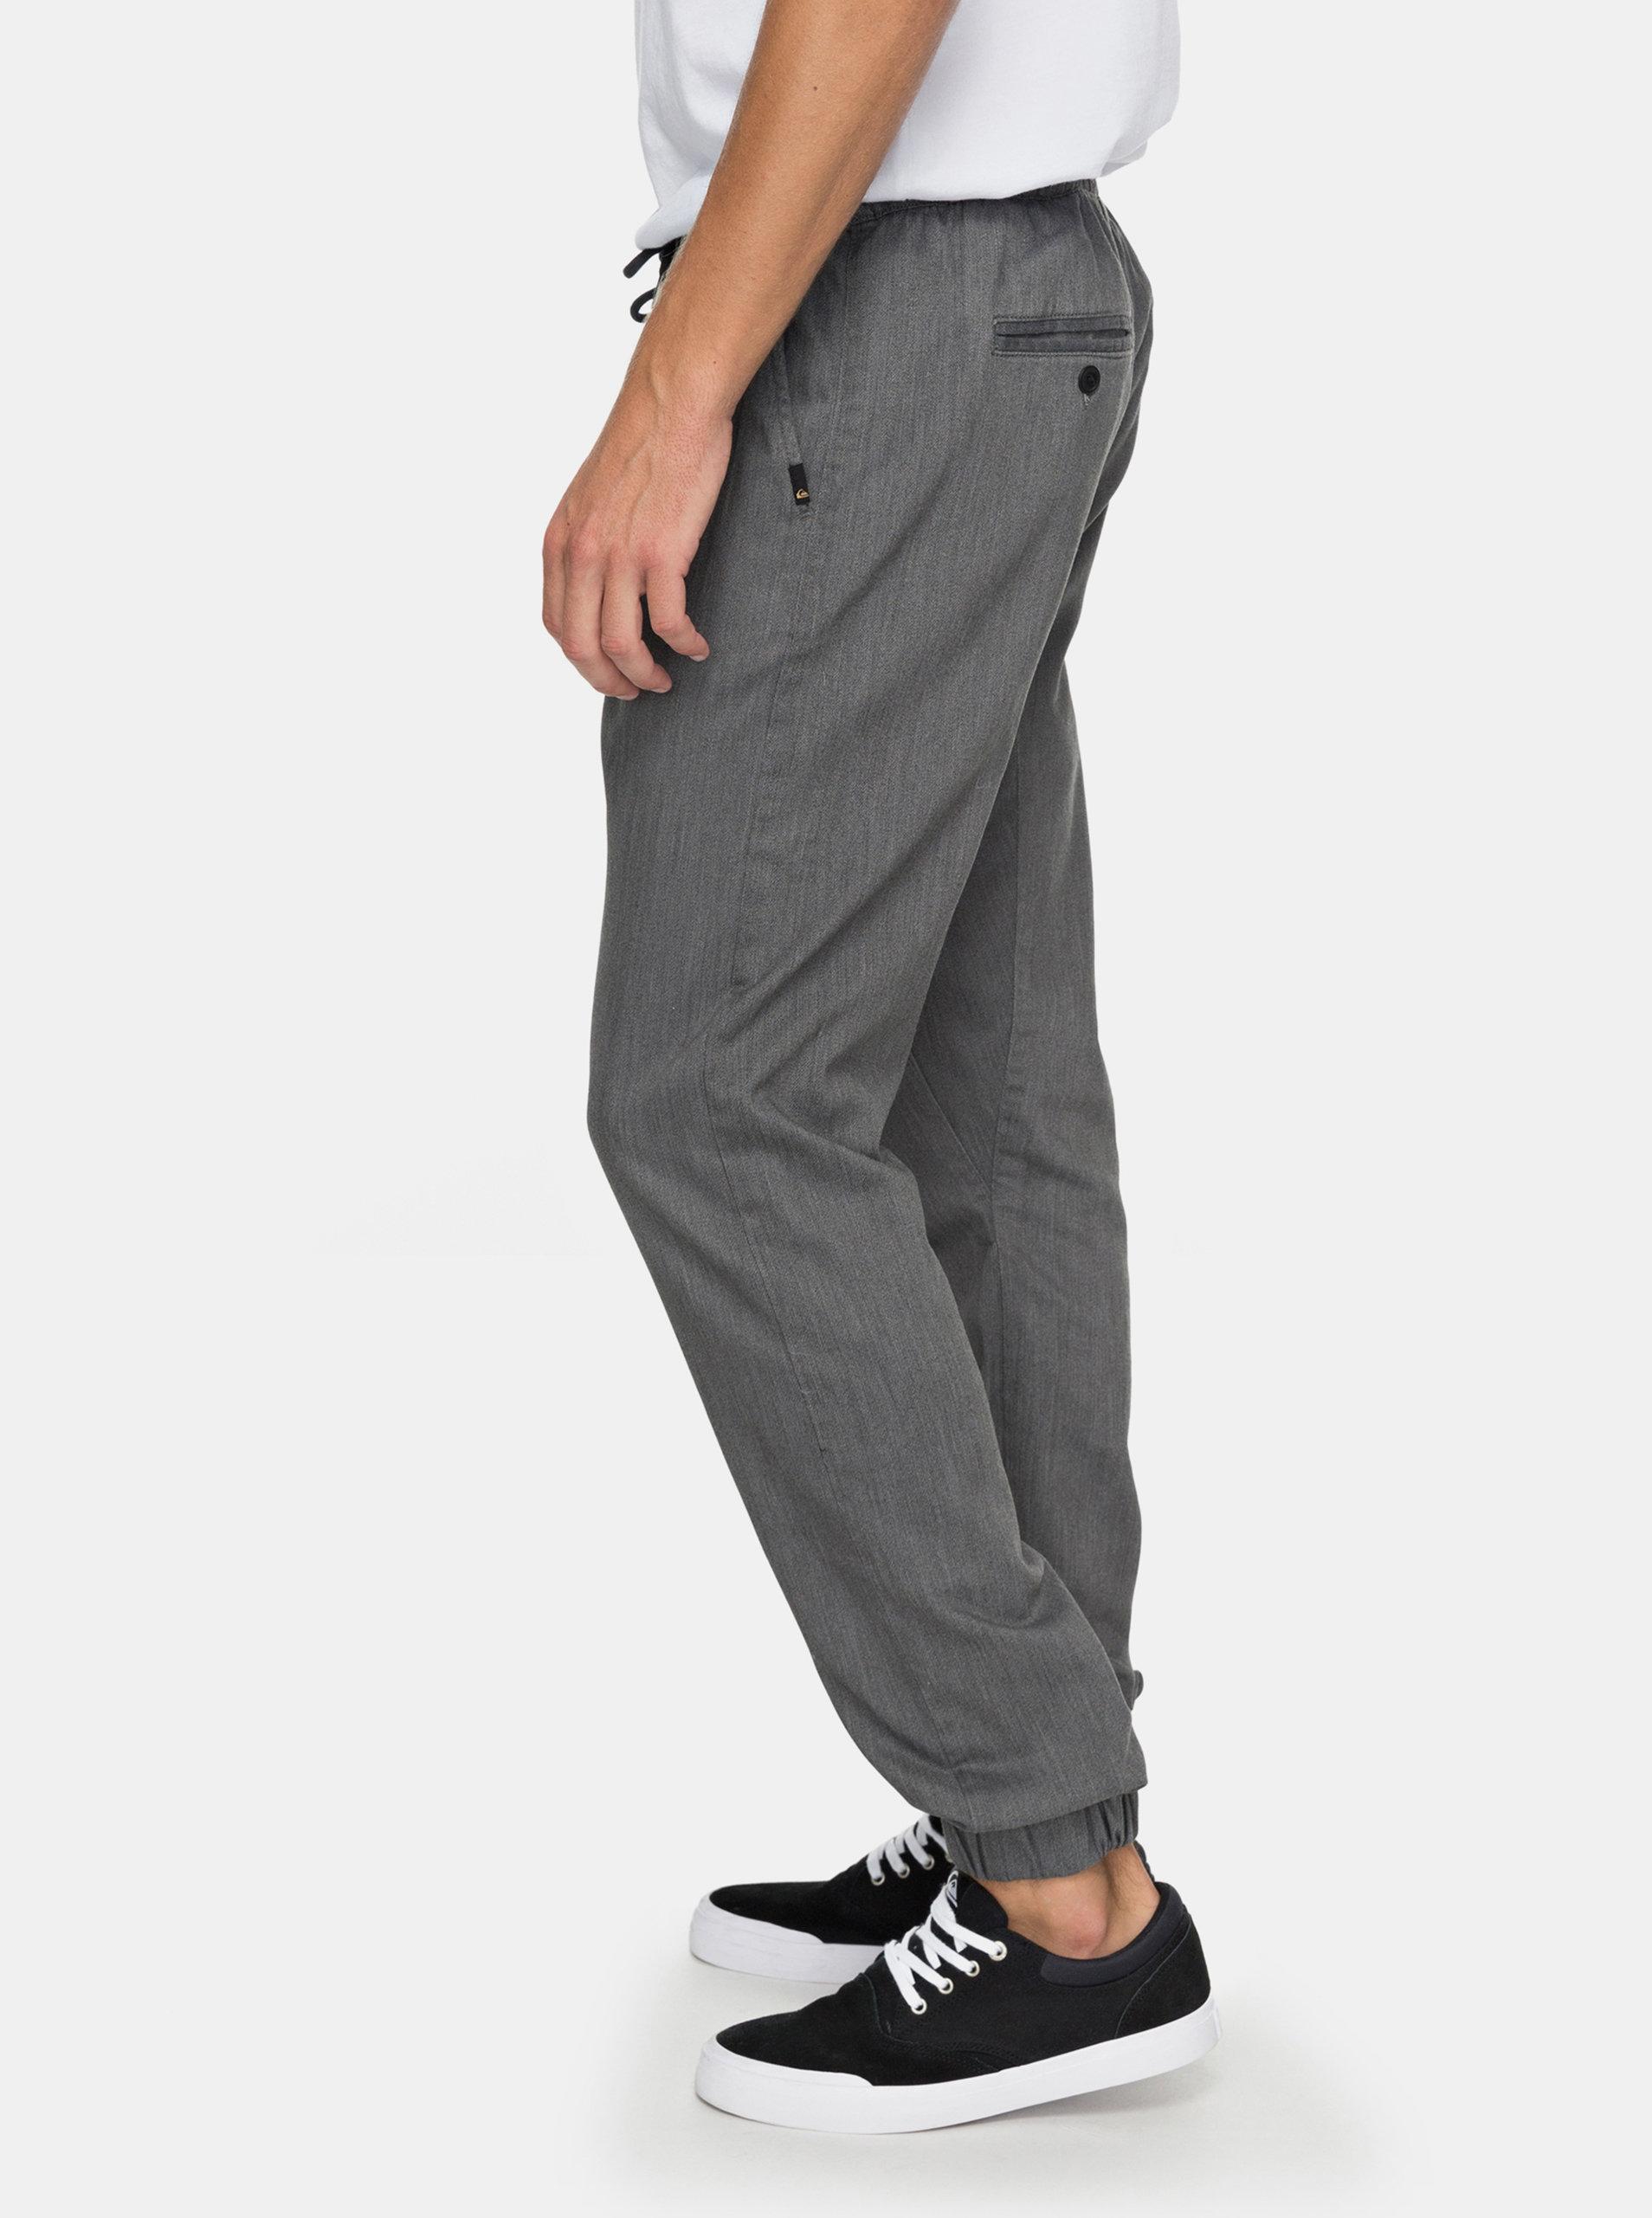 e4ea5fa00a0c Sivé pánske nohavice s gumou v páse Quiksilver ...